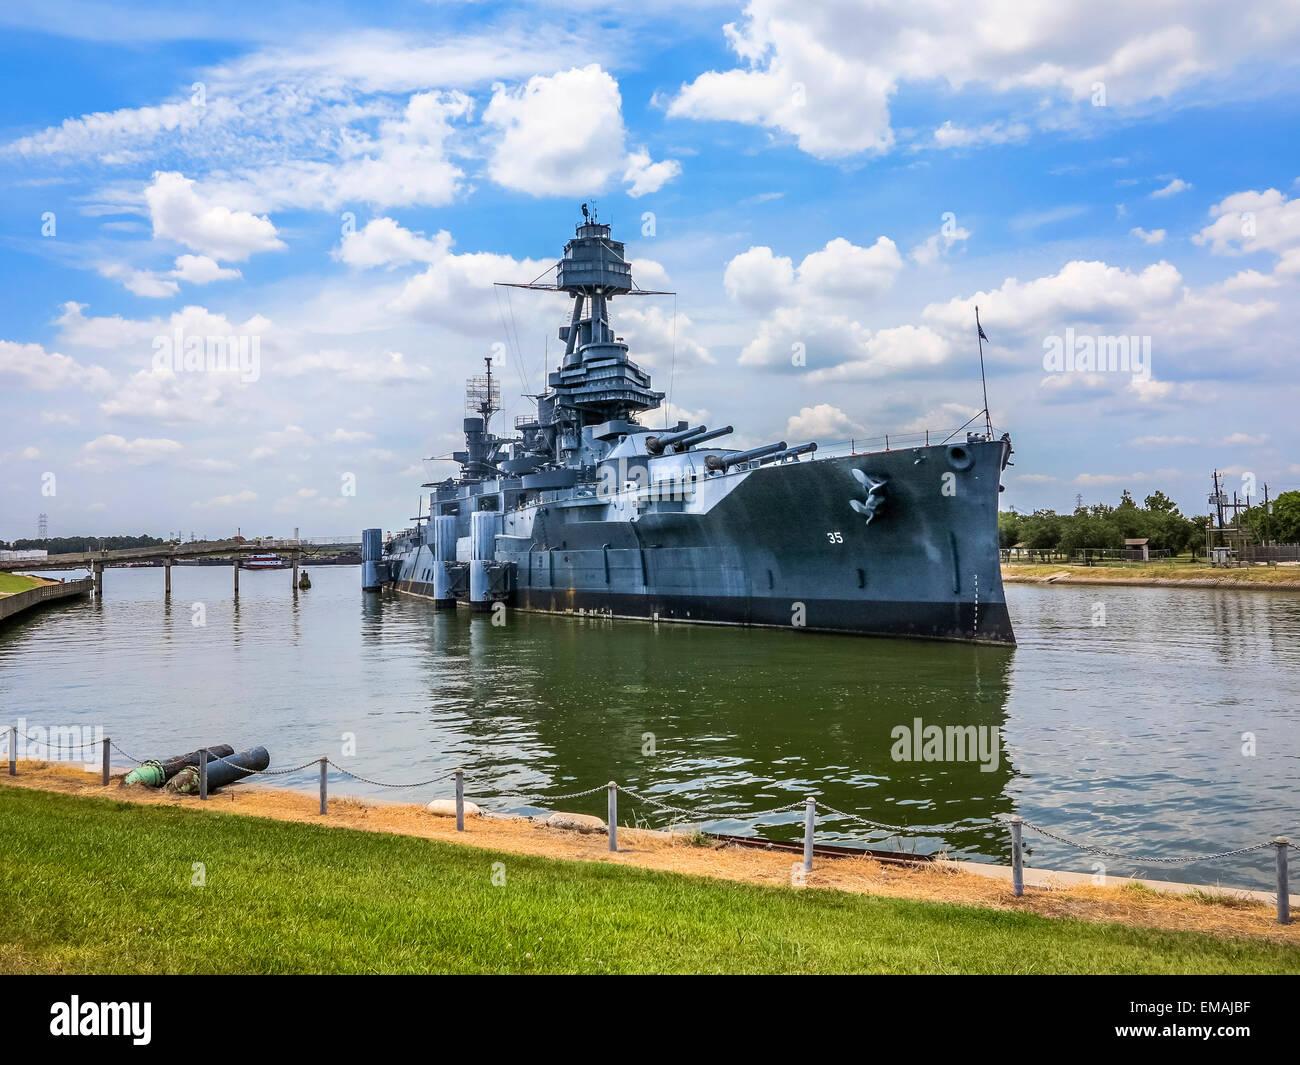 The Famous Dreadnought Battleship Texas - Stock Image